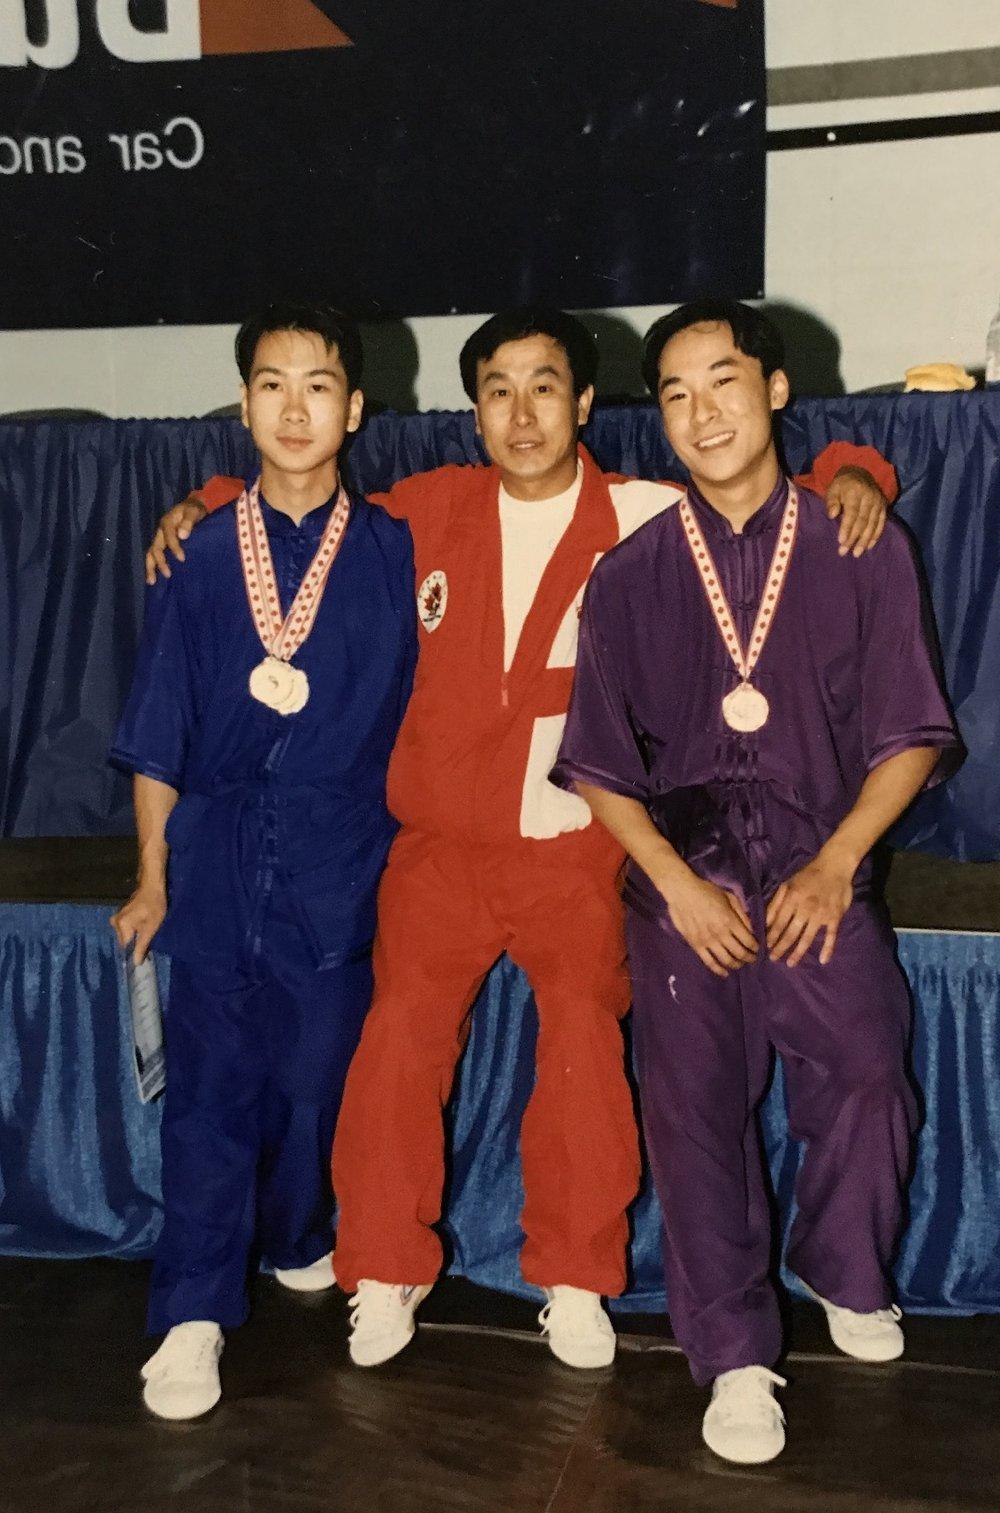 1997 Canadian Wushu Champions